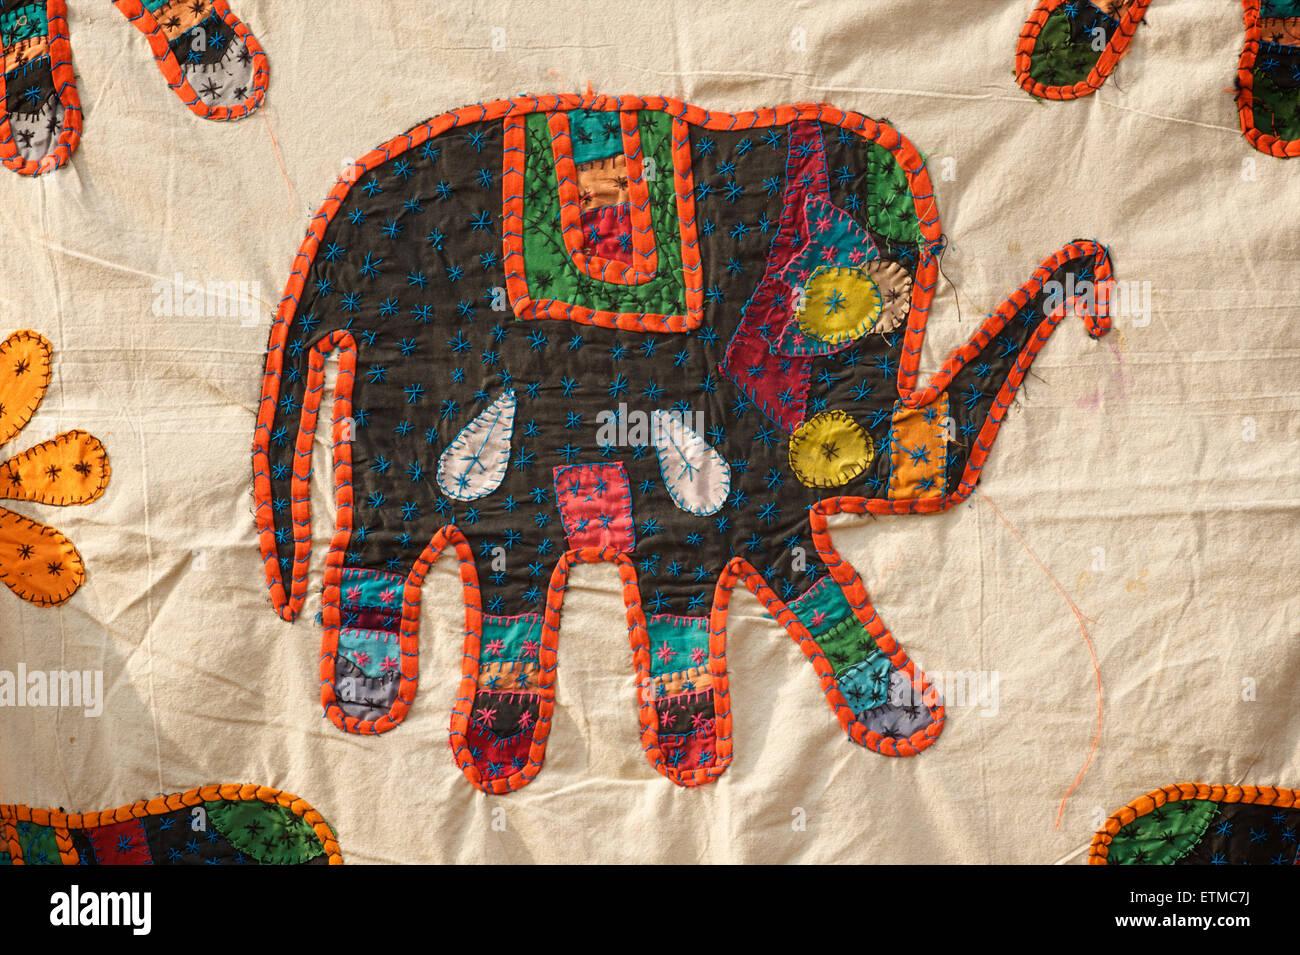 Applique Rajasthani textile with an elephant motif, Jaisalmer, Rajasthan, India - Stock Image